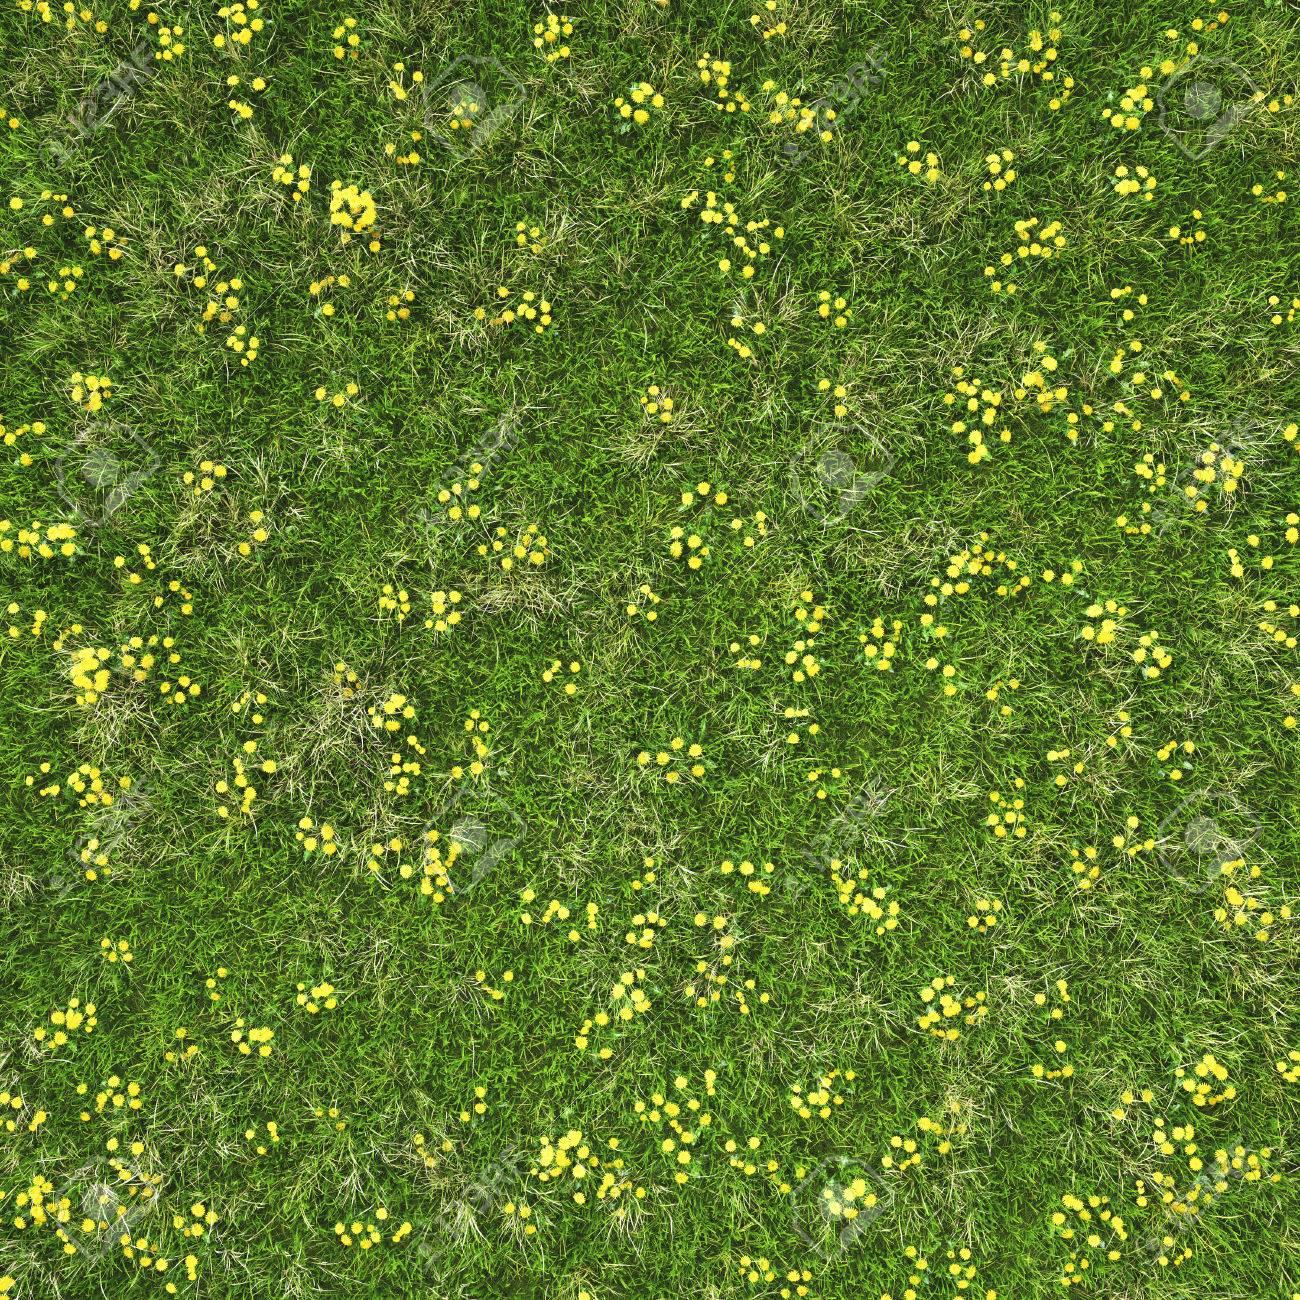 Grass and flowers background Cartoon Green Grass Field With Flowers Background Texture Stock Photo 42614038 123rfcom Green Grass Field With Flowers Background Texture Stock Photo